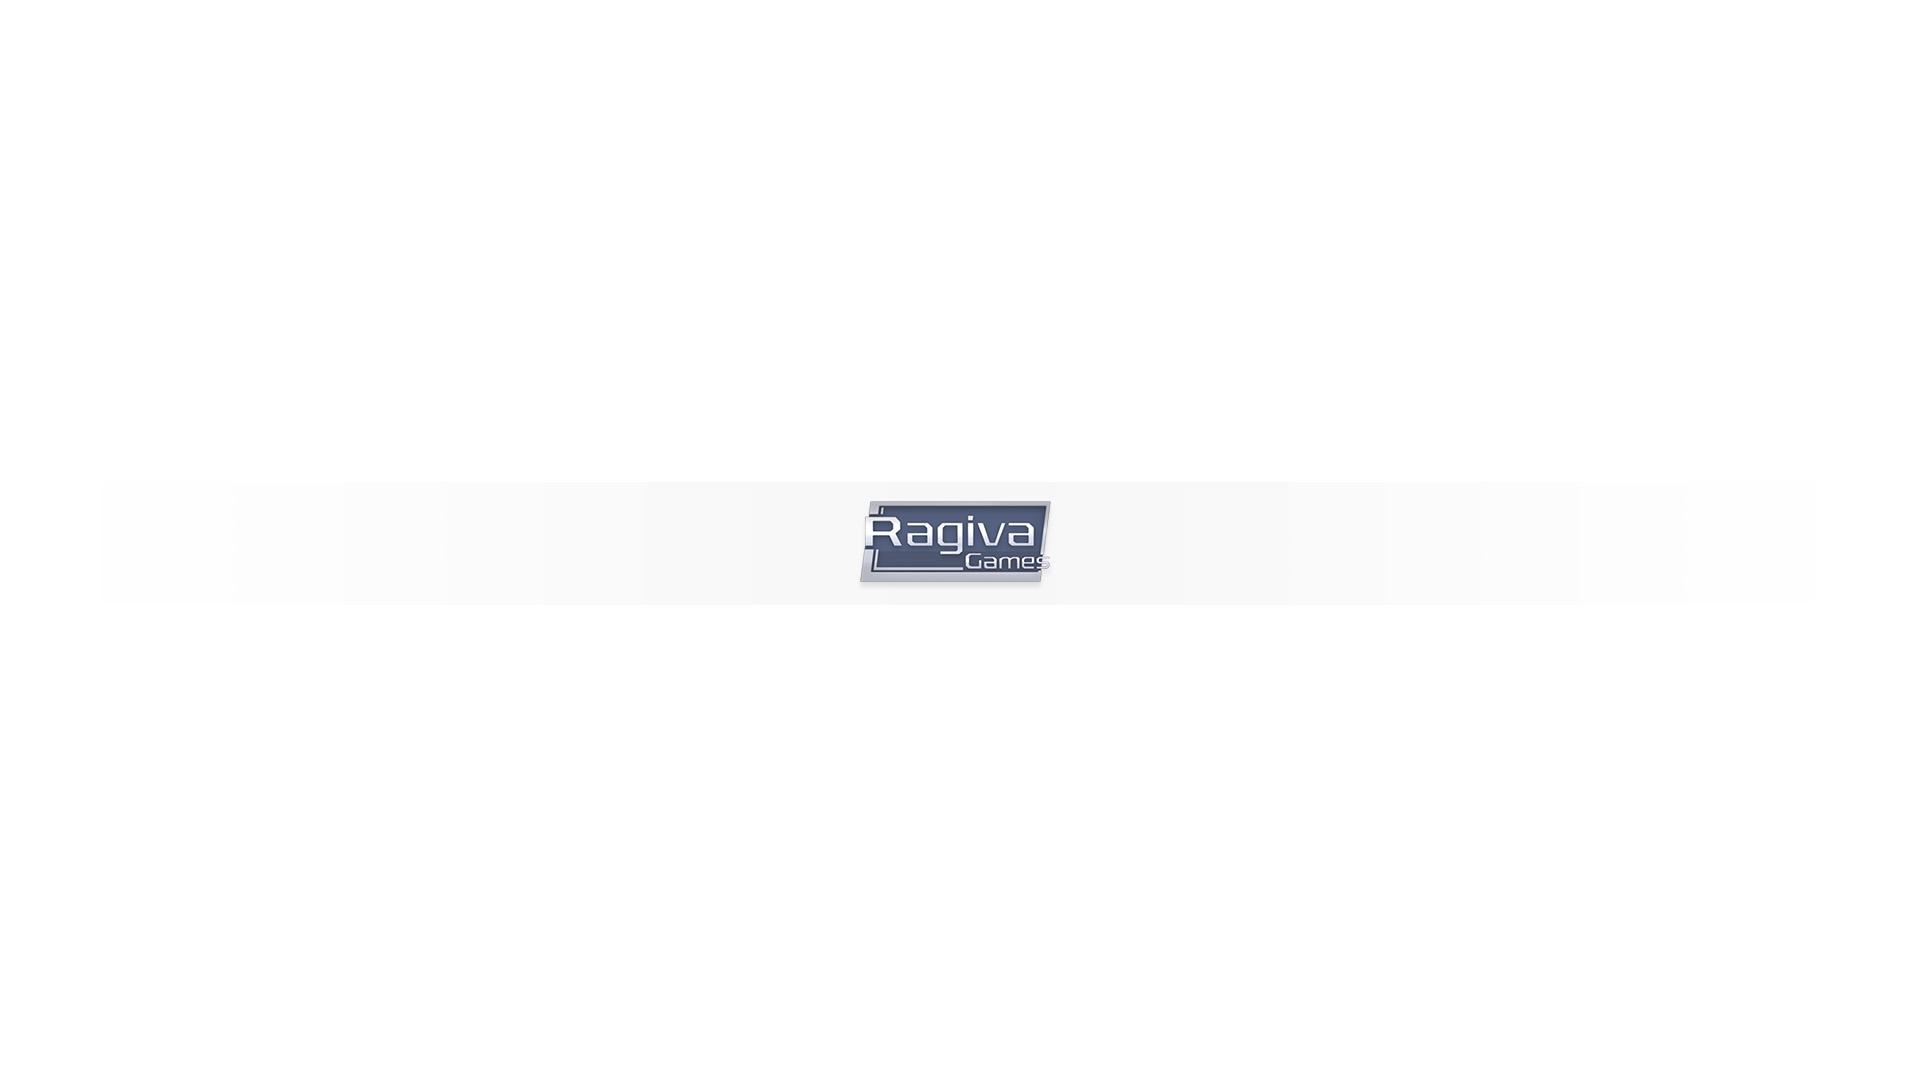 Ragiva Logo